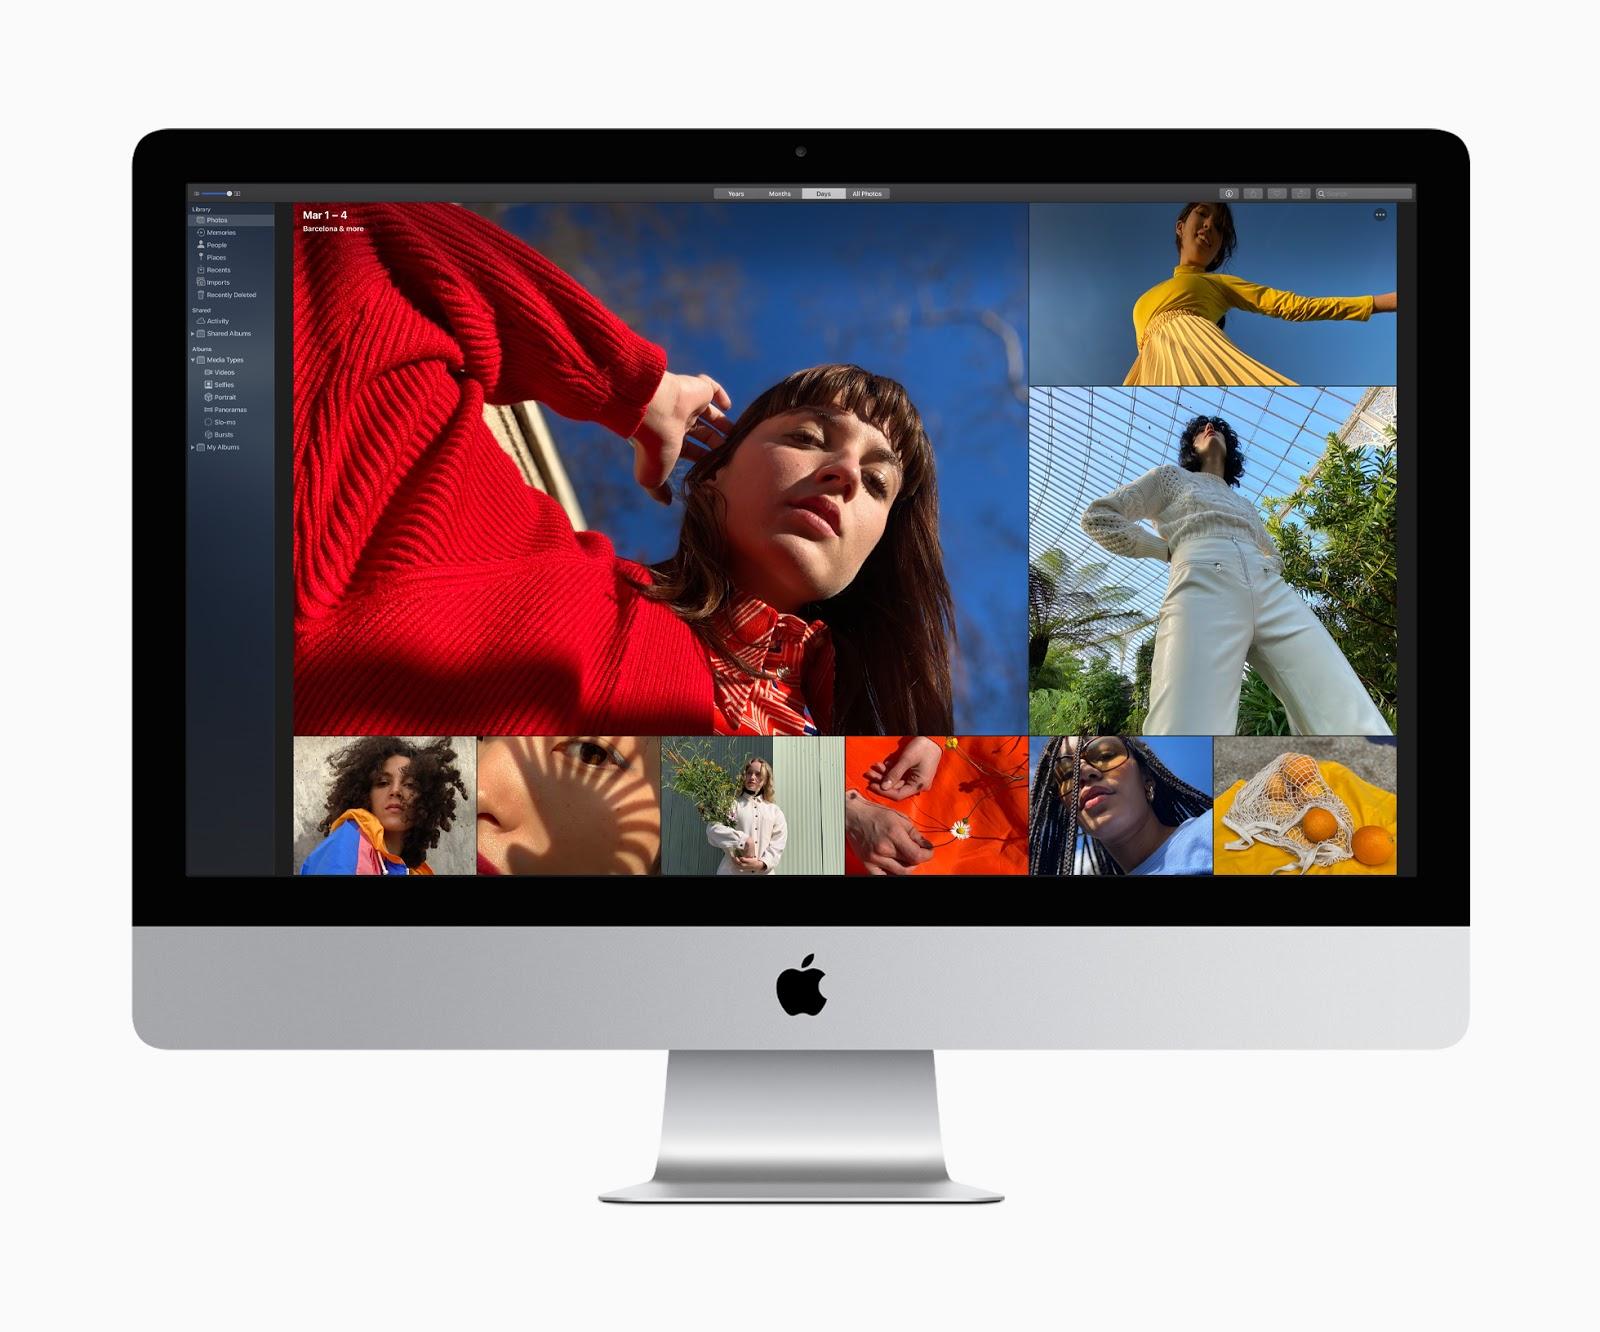 2020 27-inch iMac gets a major update